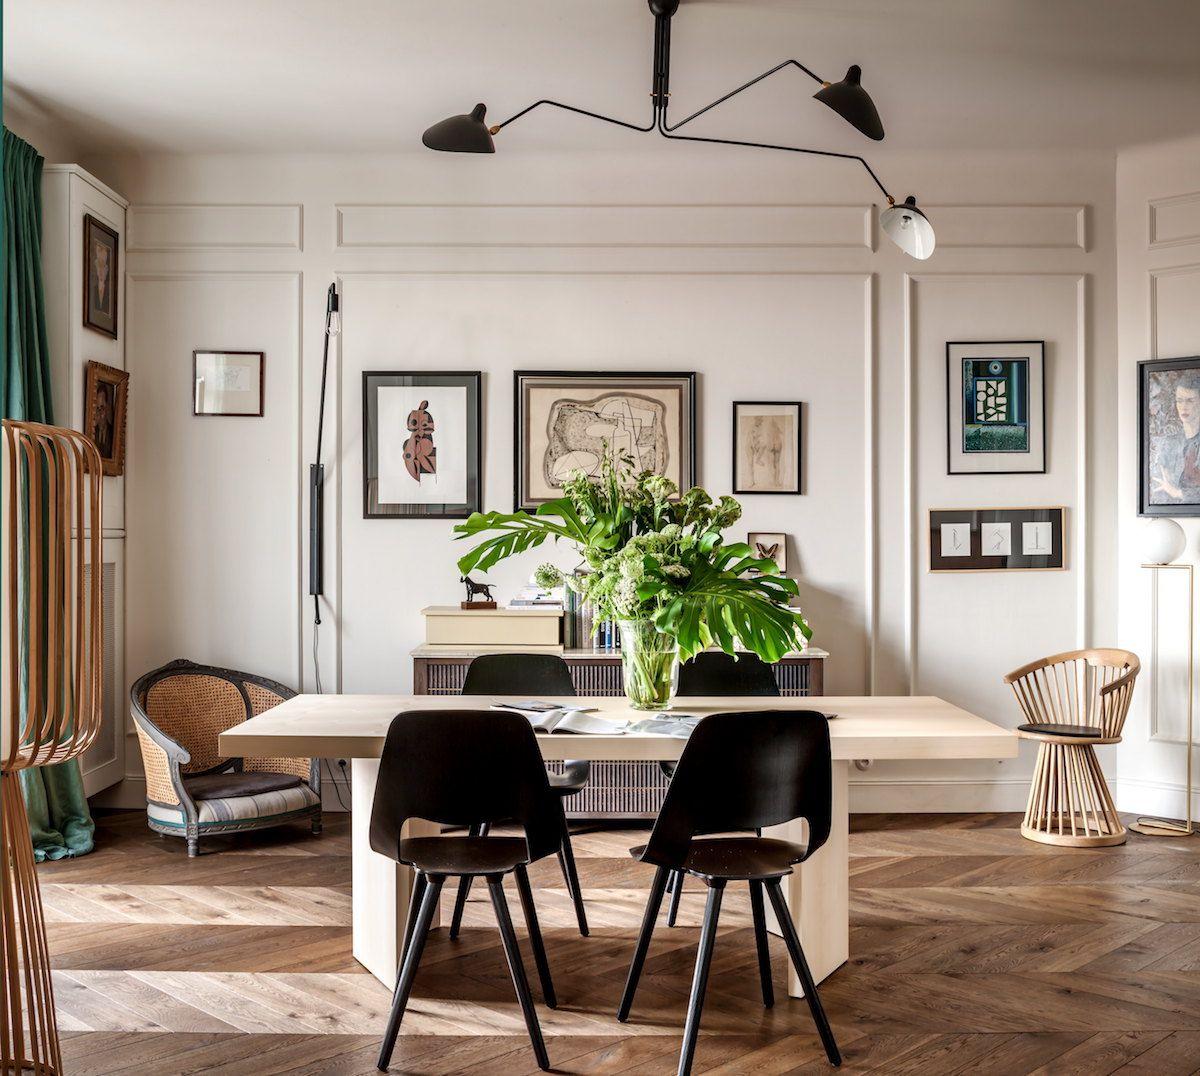 Appartamento in stile francese a varsavia foto living for Arredamento stile parigino